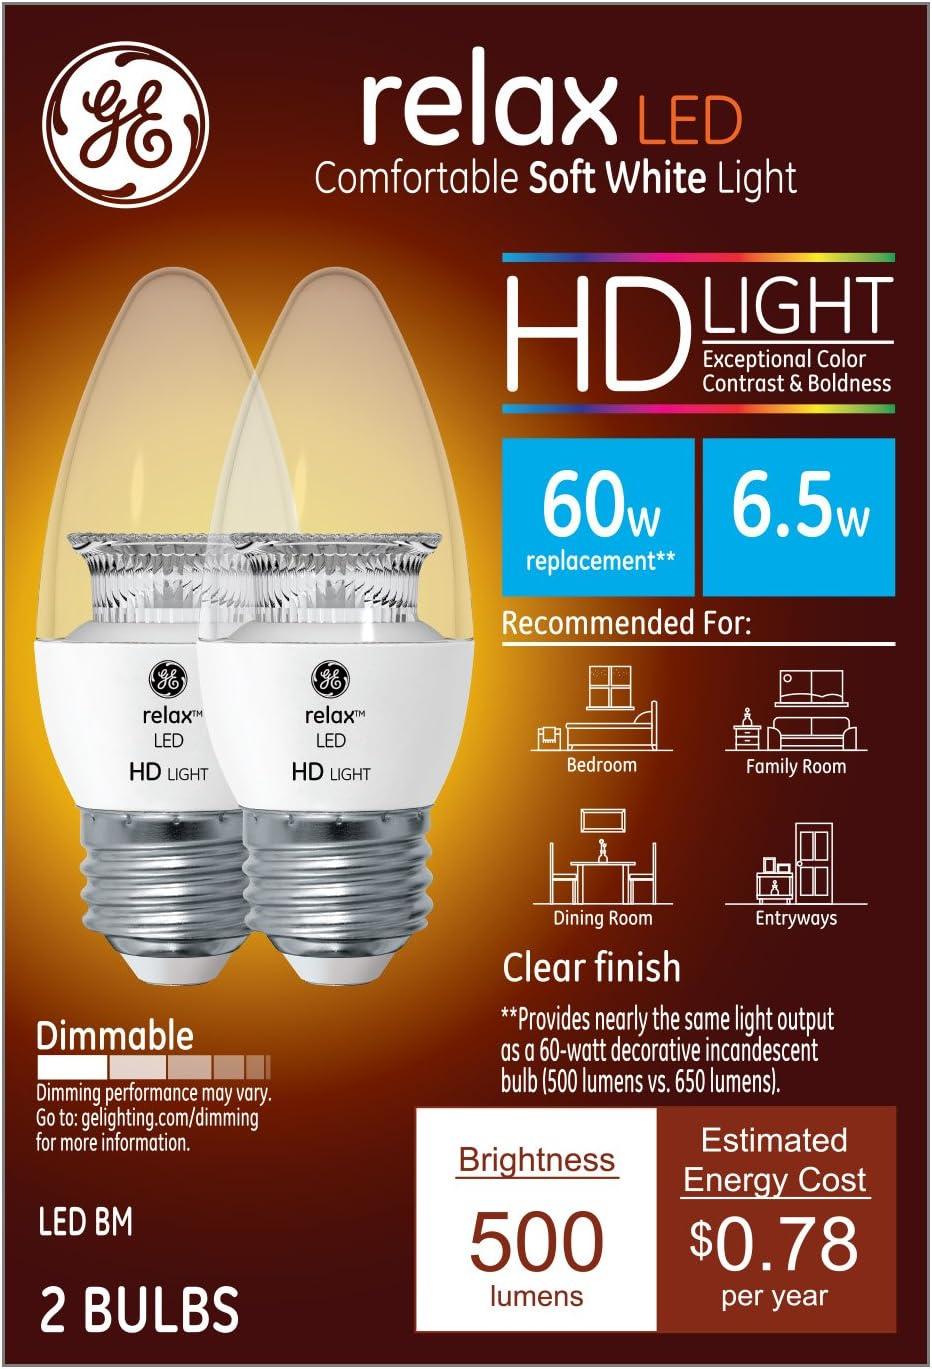 GE Lighting 92301 LED Relax HD 6.5 (60-watt Replacement), 500-Lumen Blunt Tip Light Bulb with Medium Base, Soft White, 2-Pack, Standard